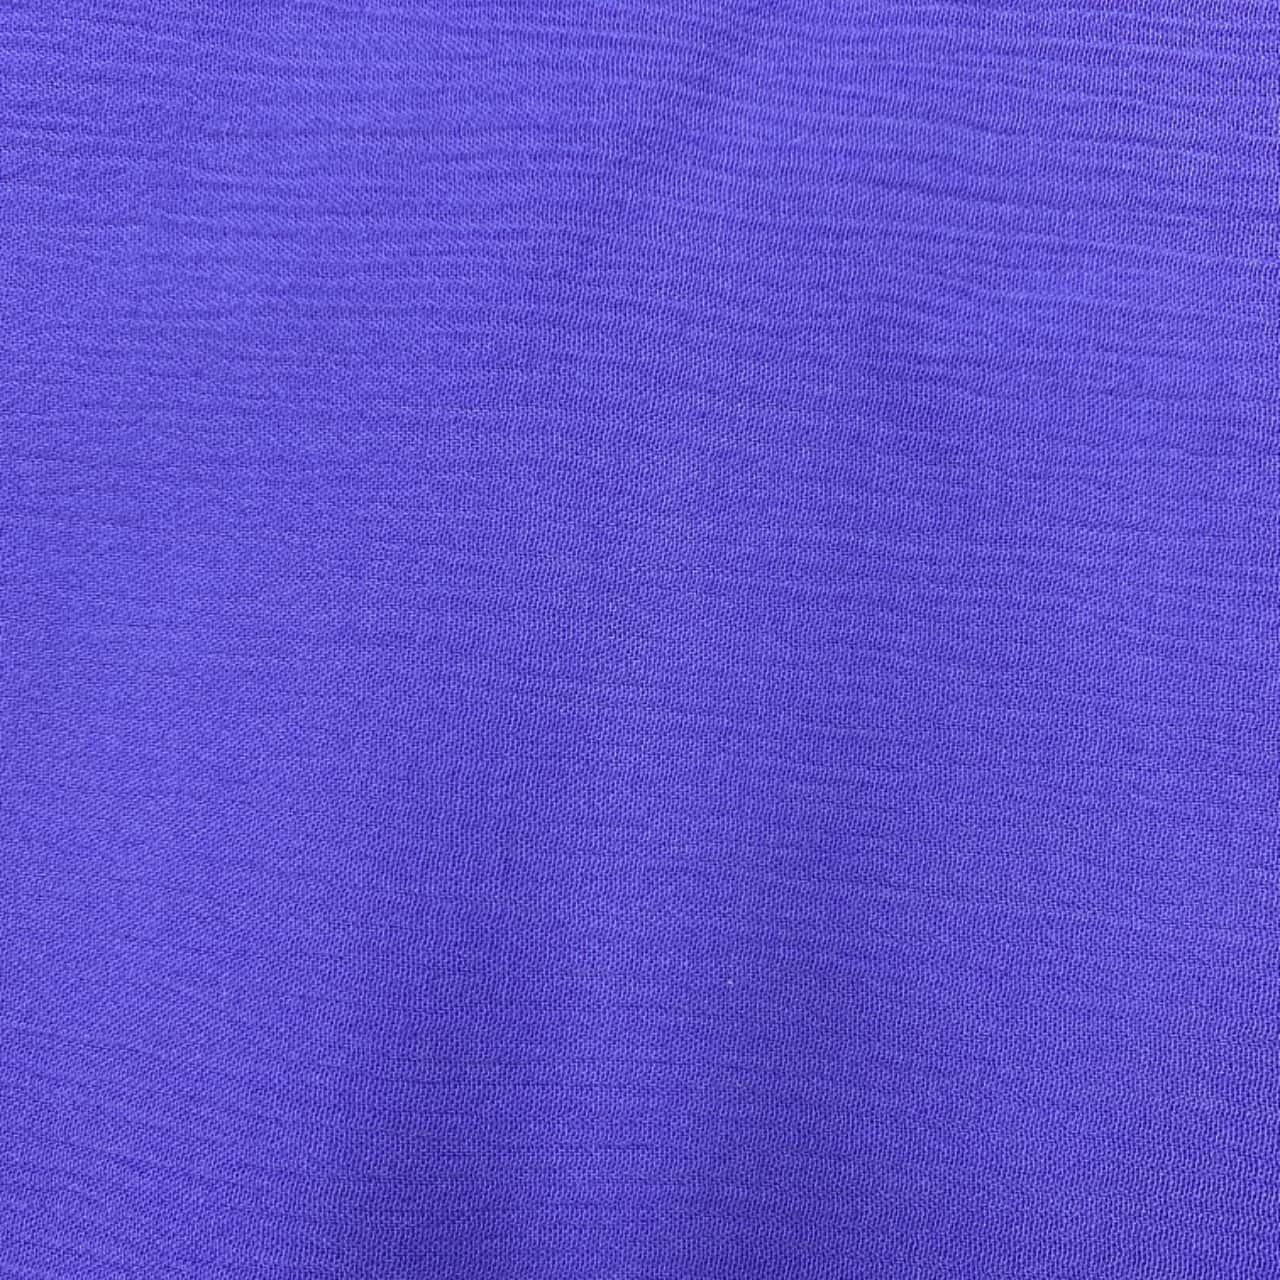 BNWT Plain Purple Fabric 160x140cm